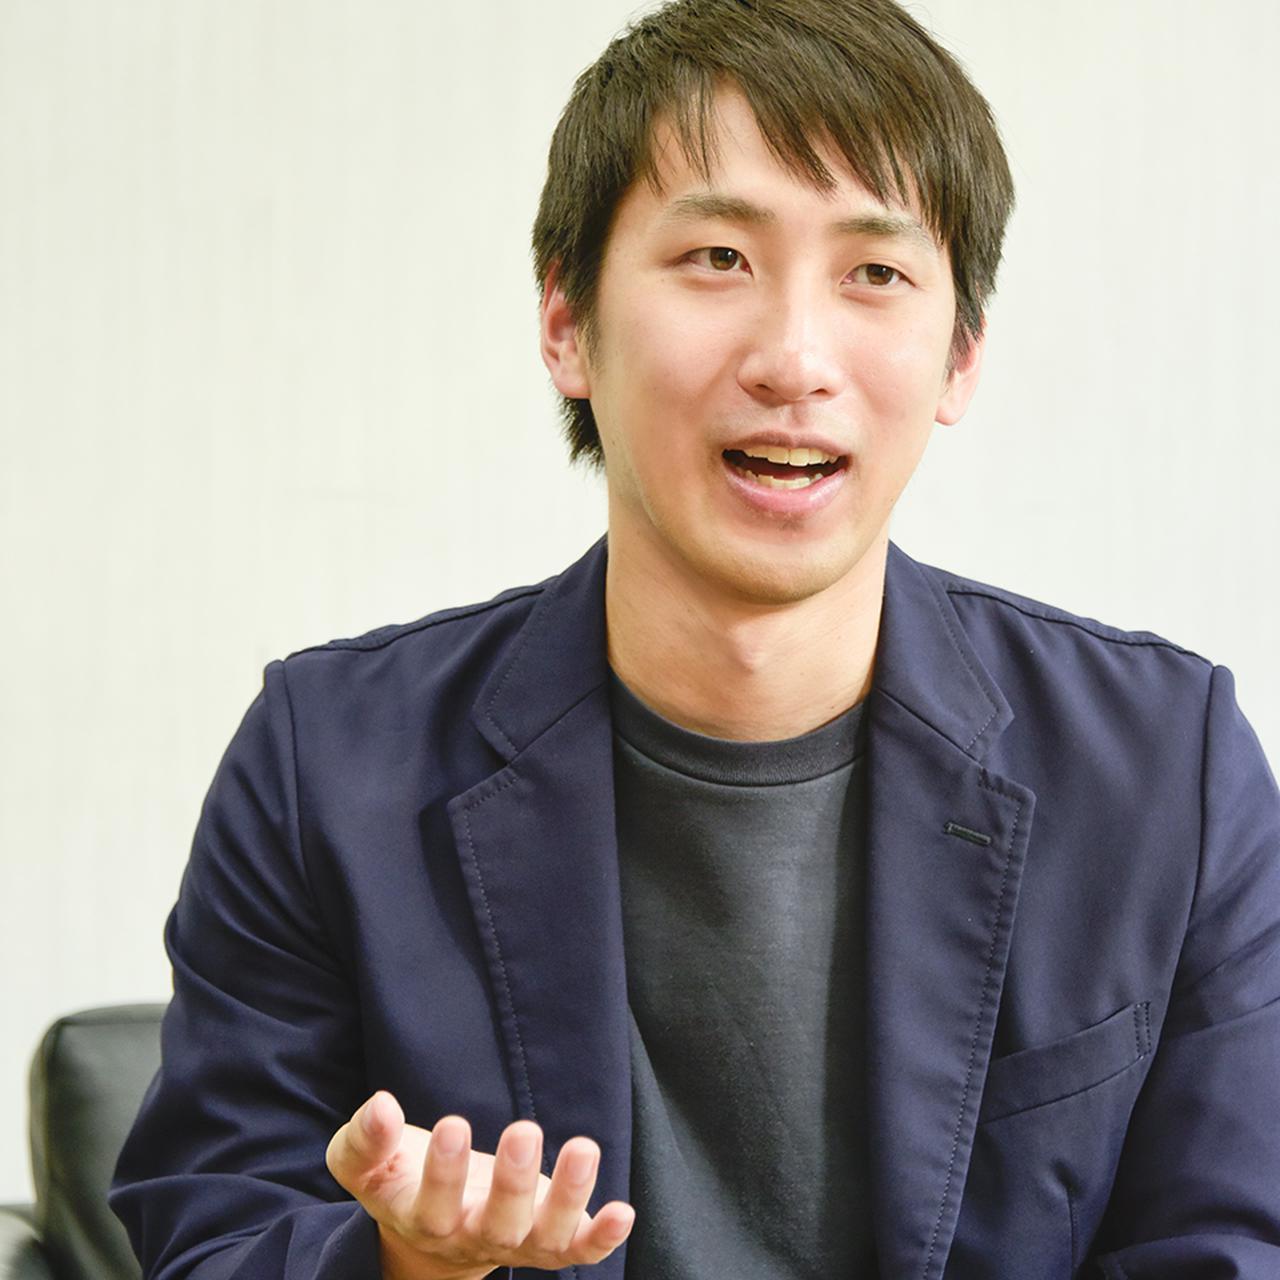 Images : 朝井リョウ(RYO ASAI)